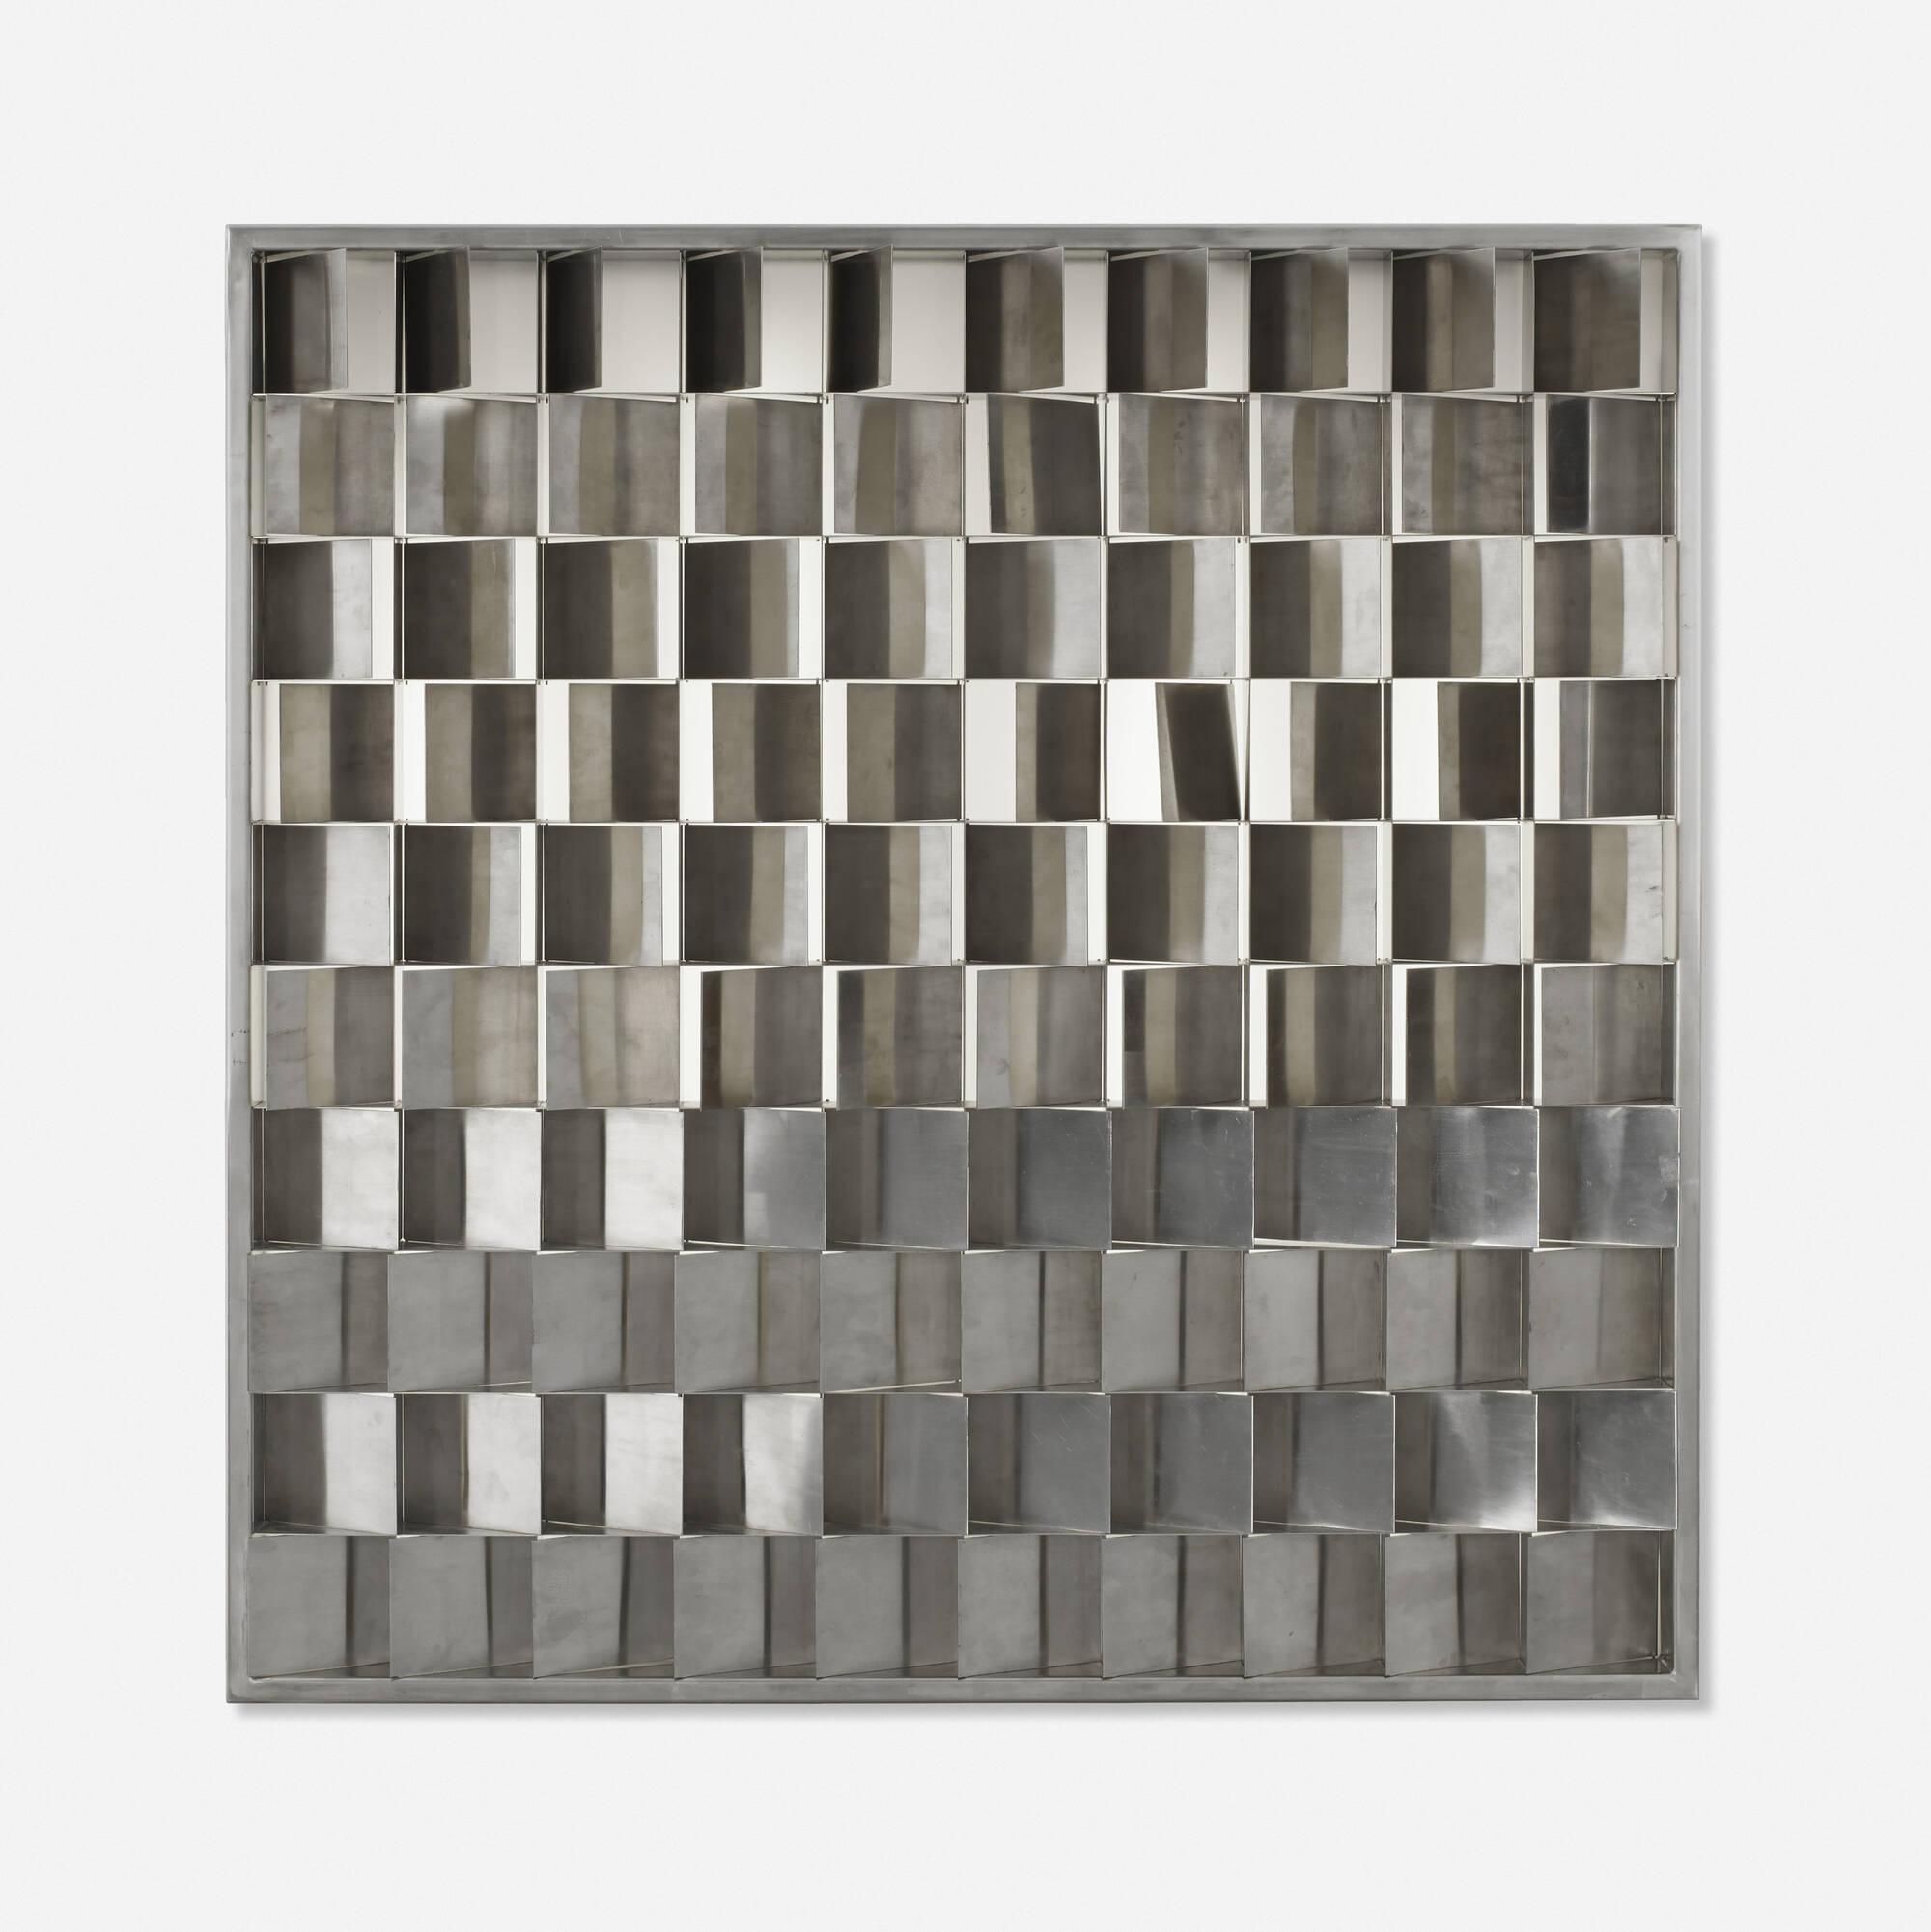 11: Gianfranco Fini / Programma wall light (1 of 3)